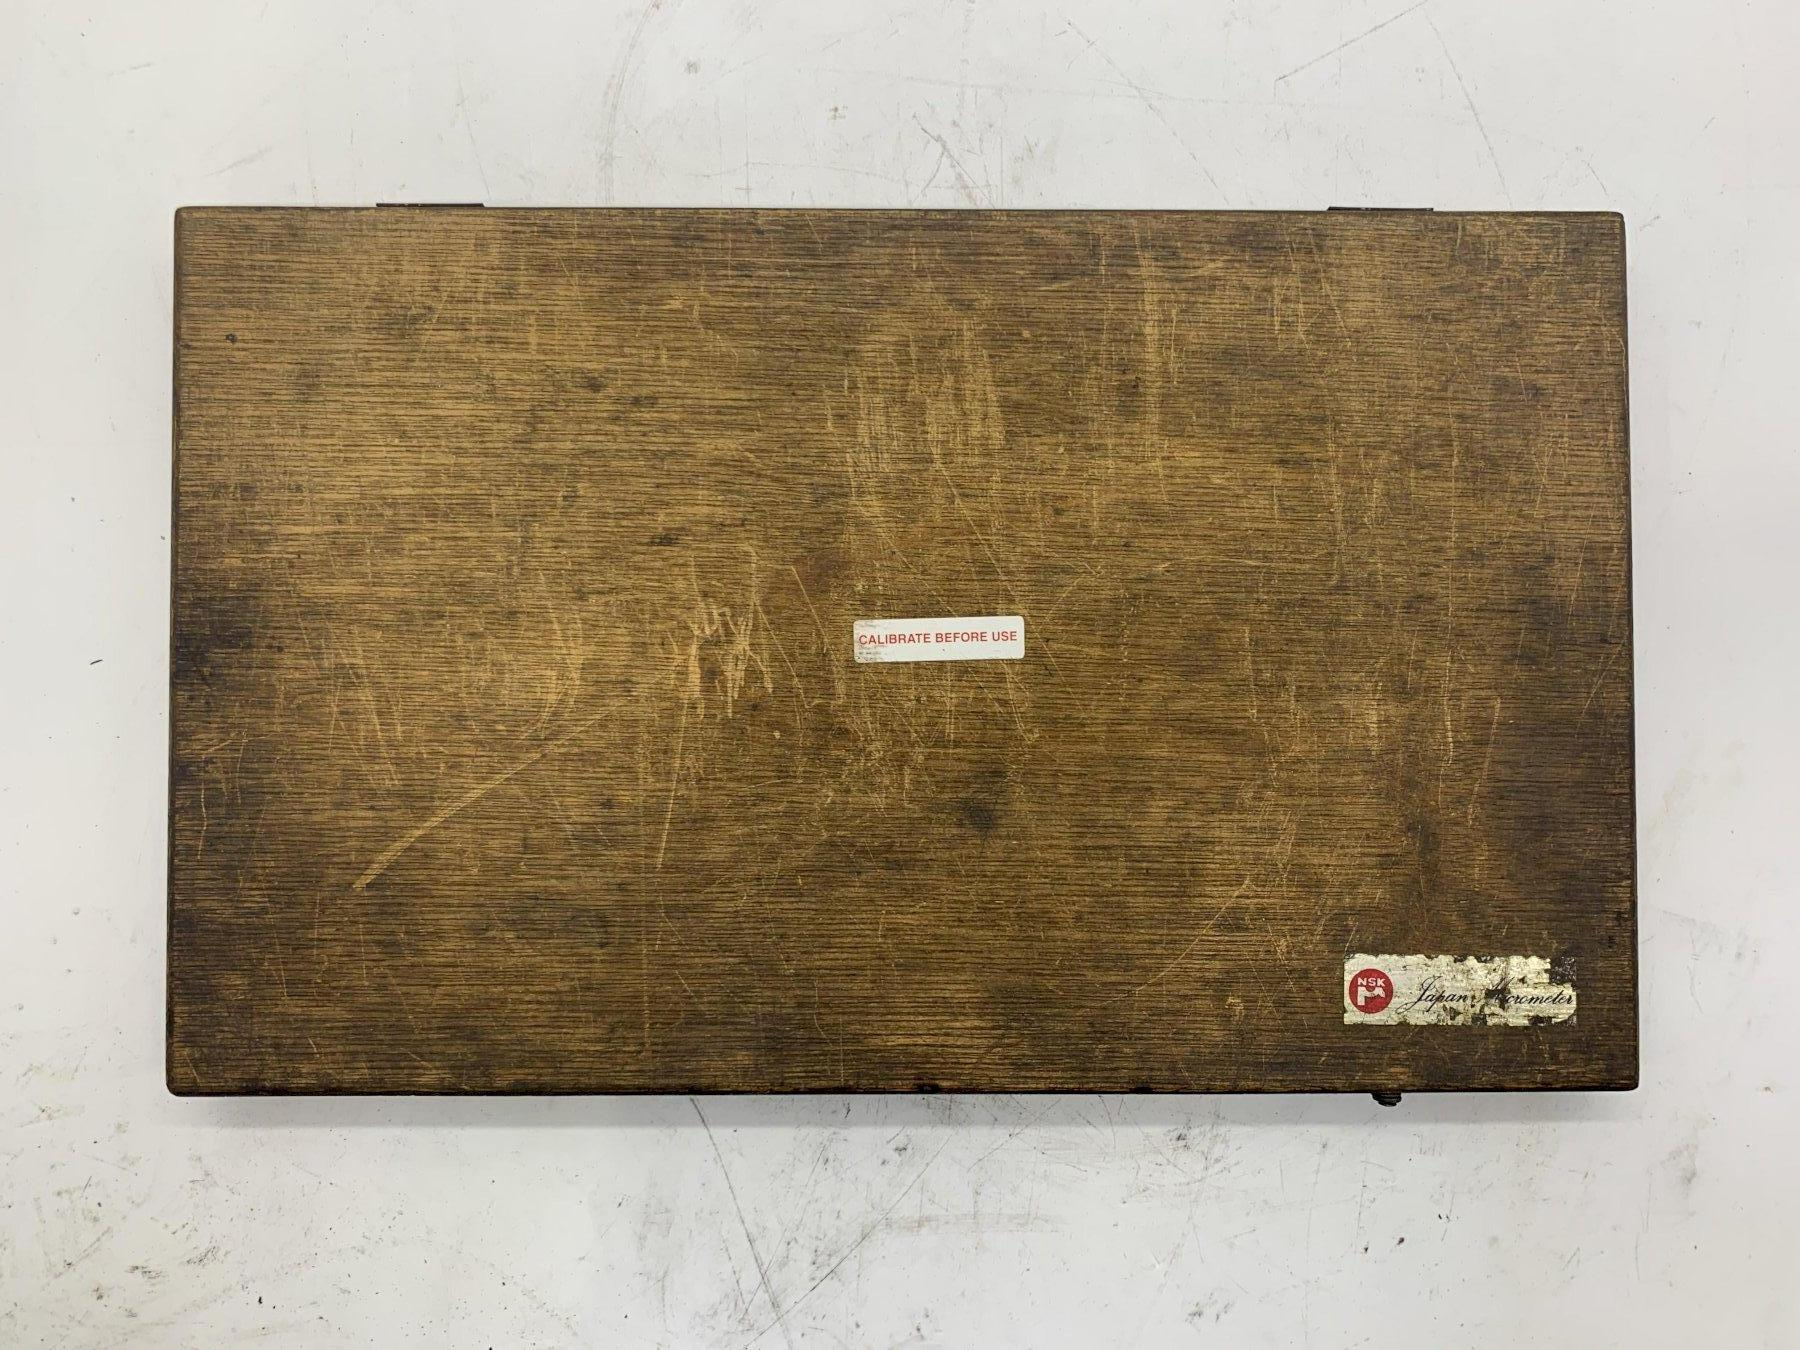 "10-11"" NSK JAPAN OUTSIDE MICROMETER N9452 [.0001 GRADUATION] STOCK #15539"